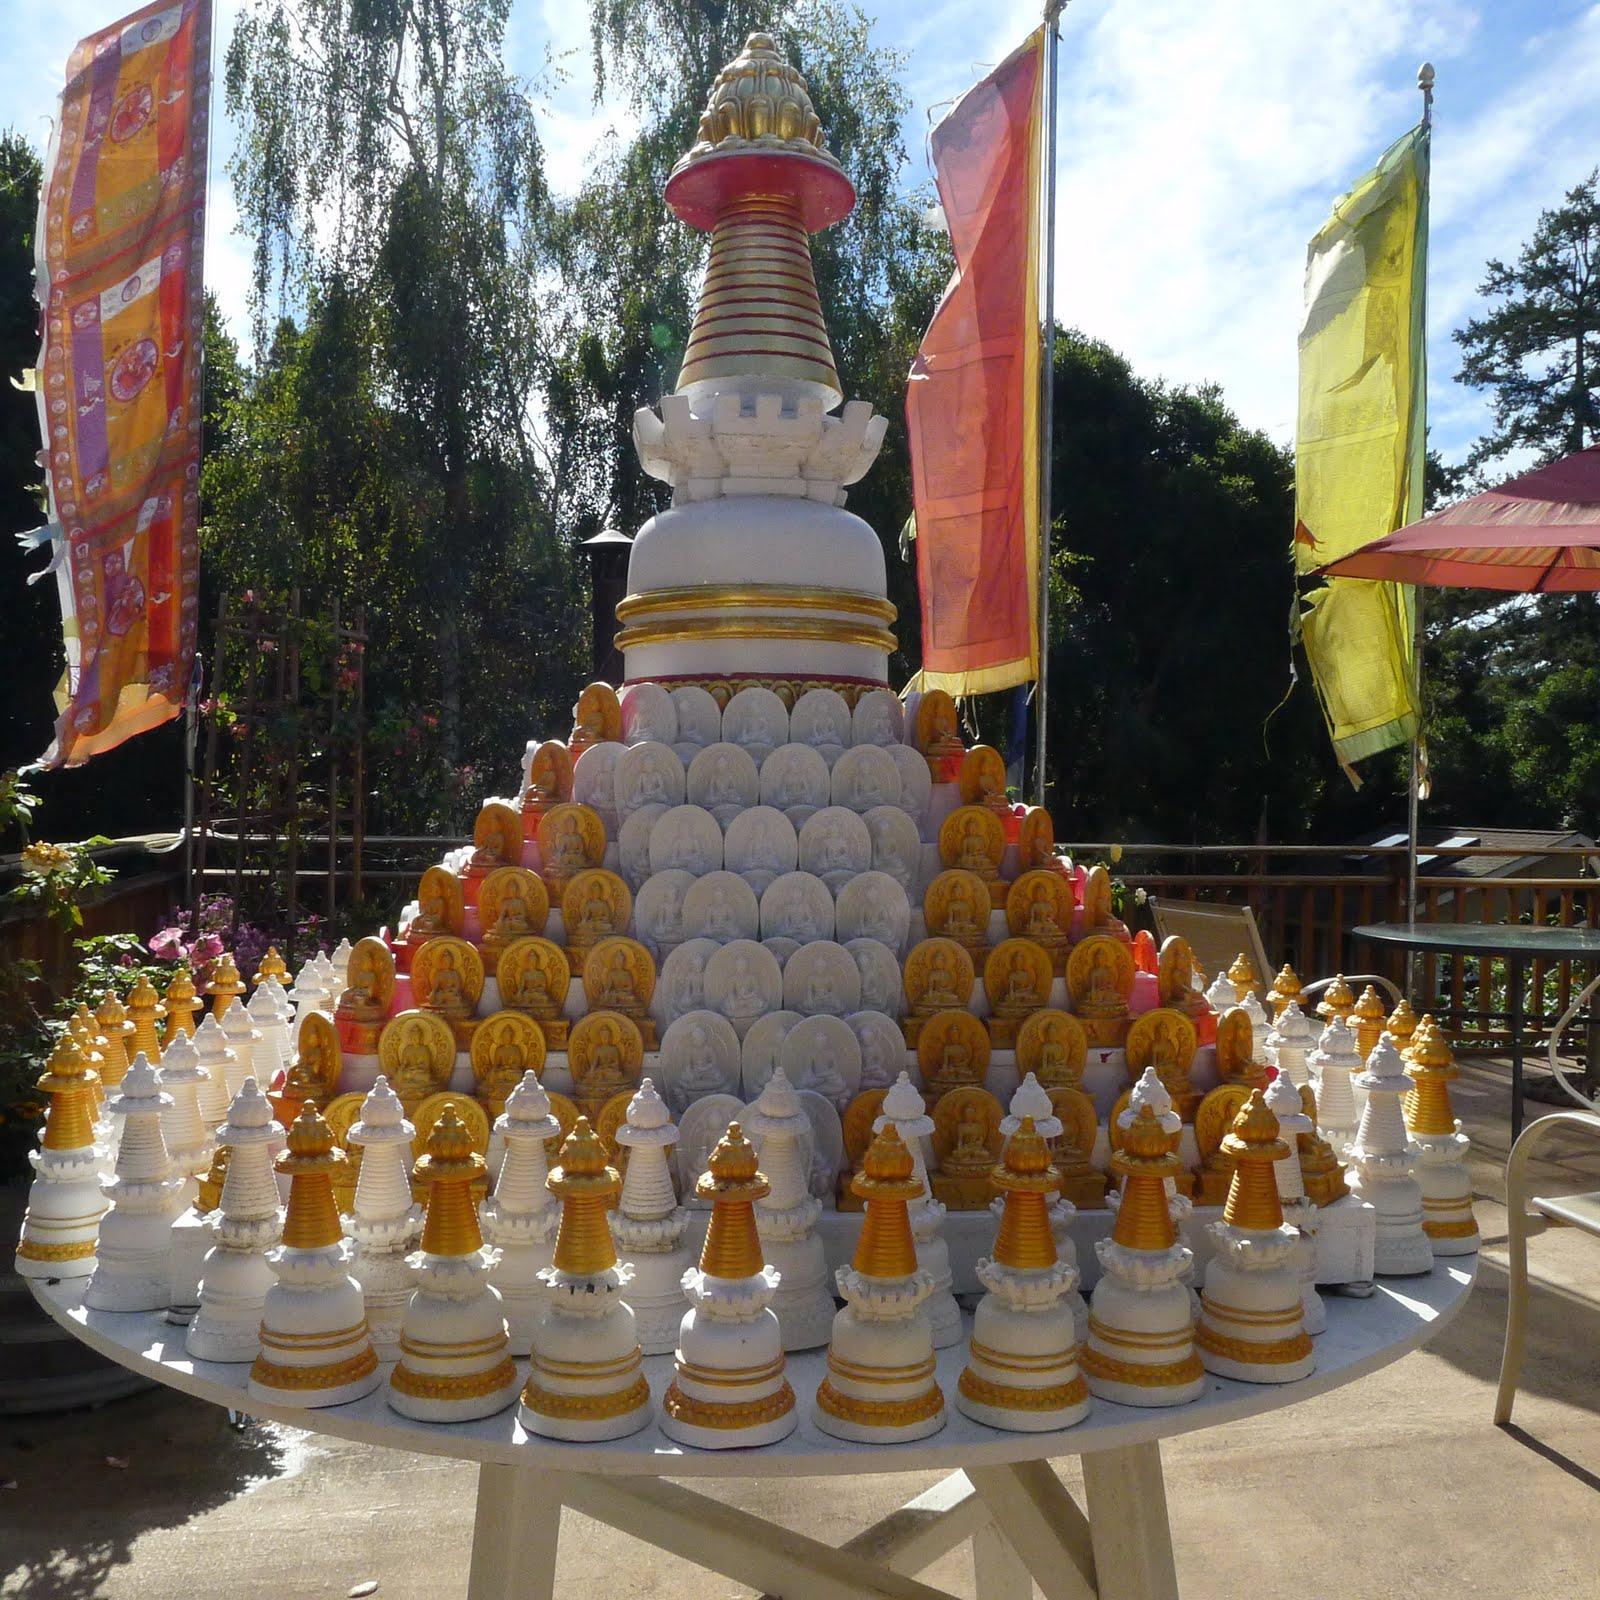 Table with many small Kadampa stupas to circumambulate Kachoe Dechen Ling,  Aptos, CA, USA.